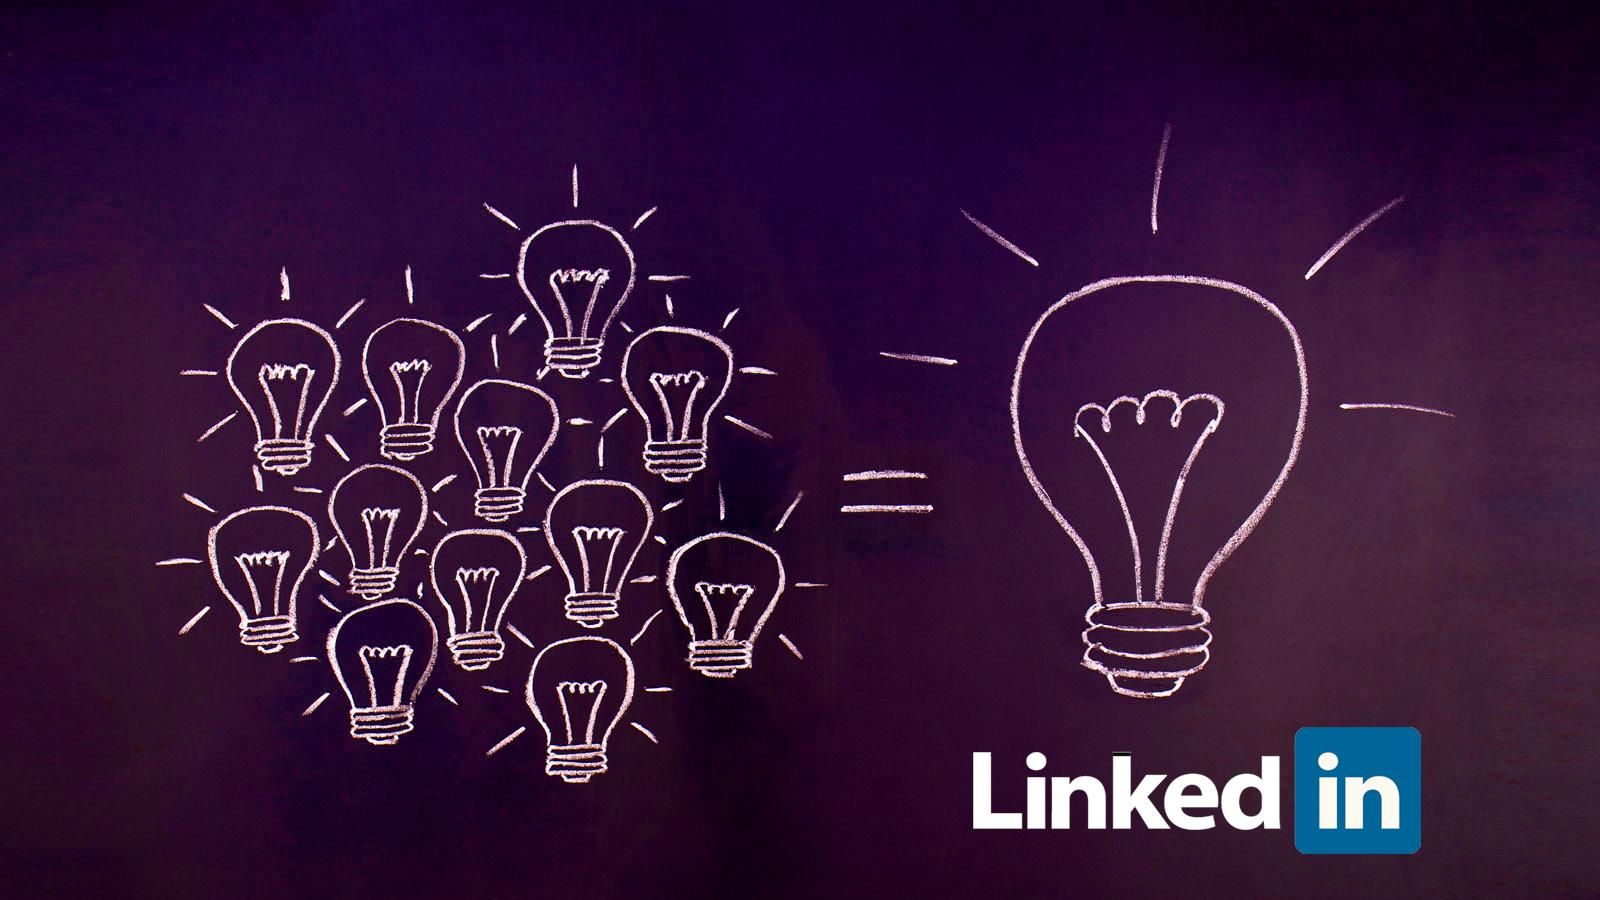 LinkedIn Wallpapers - Wallpaper Cave